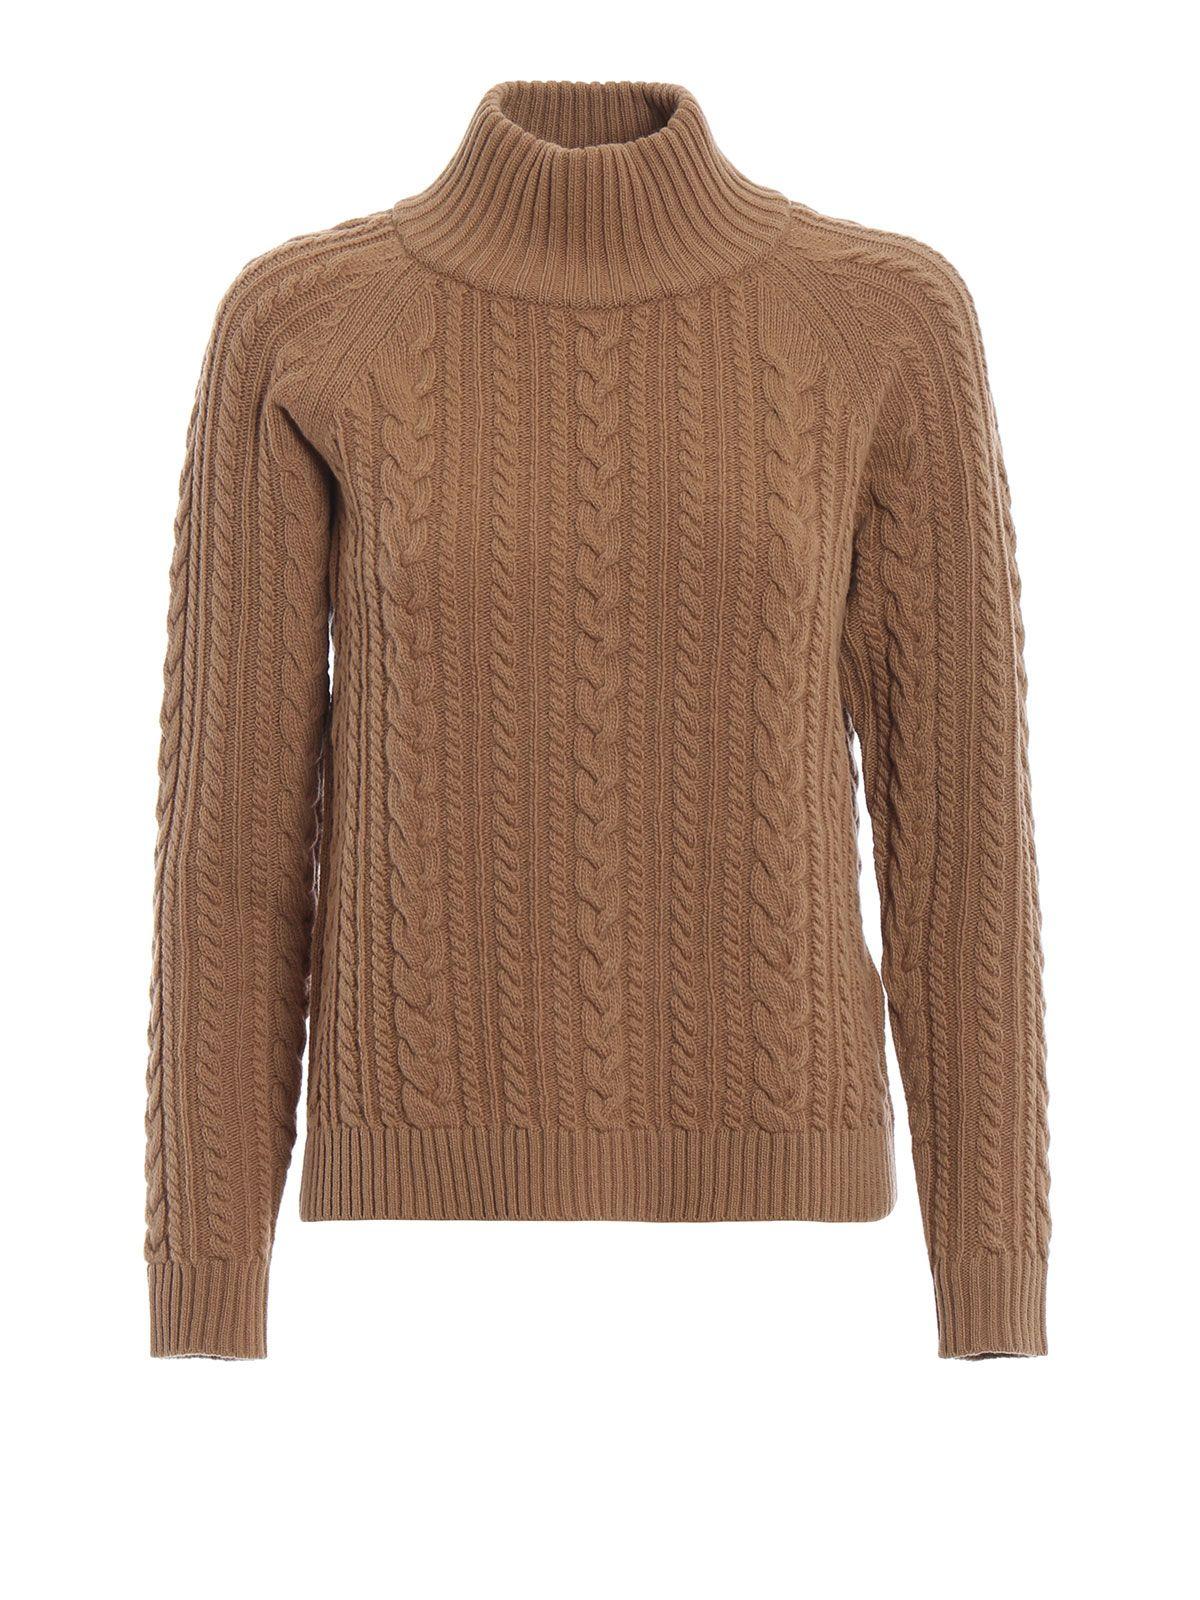 max mara - Brando Light Brown Braided Wool Turtleneck